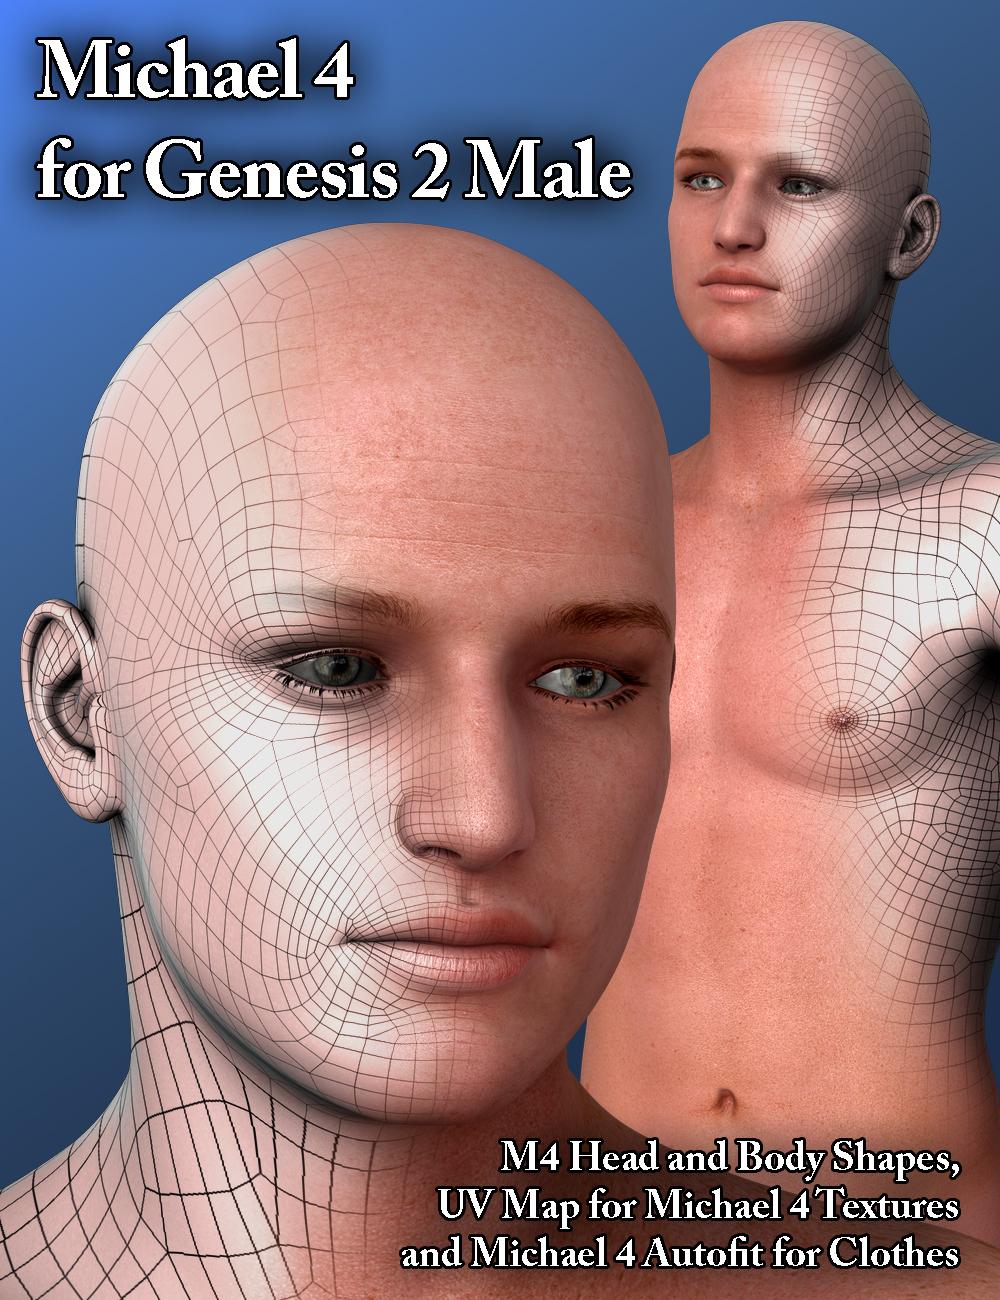 Michael 4 for Genesis 2 Male by: SloshWerks, 3D Models by Daz 3D